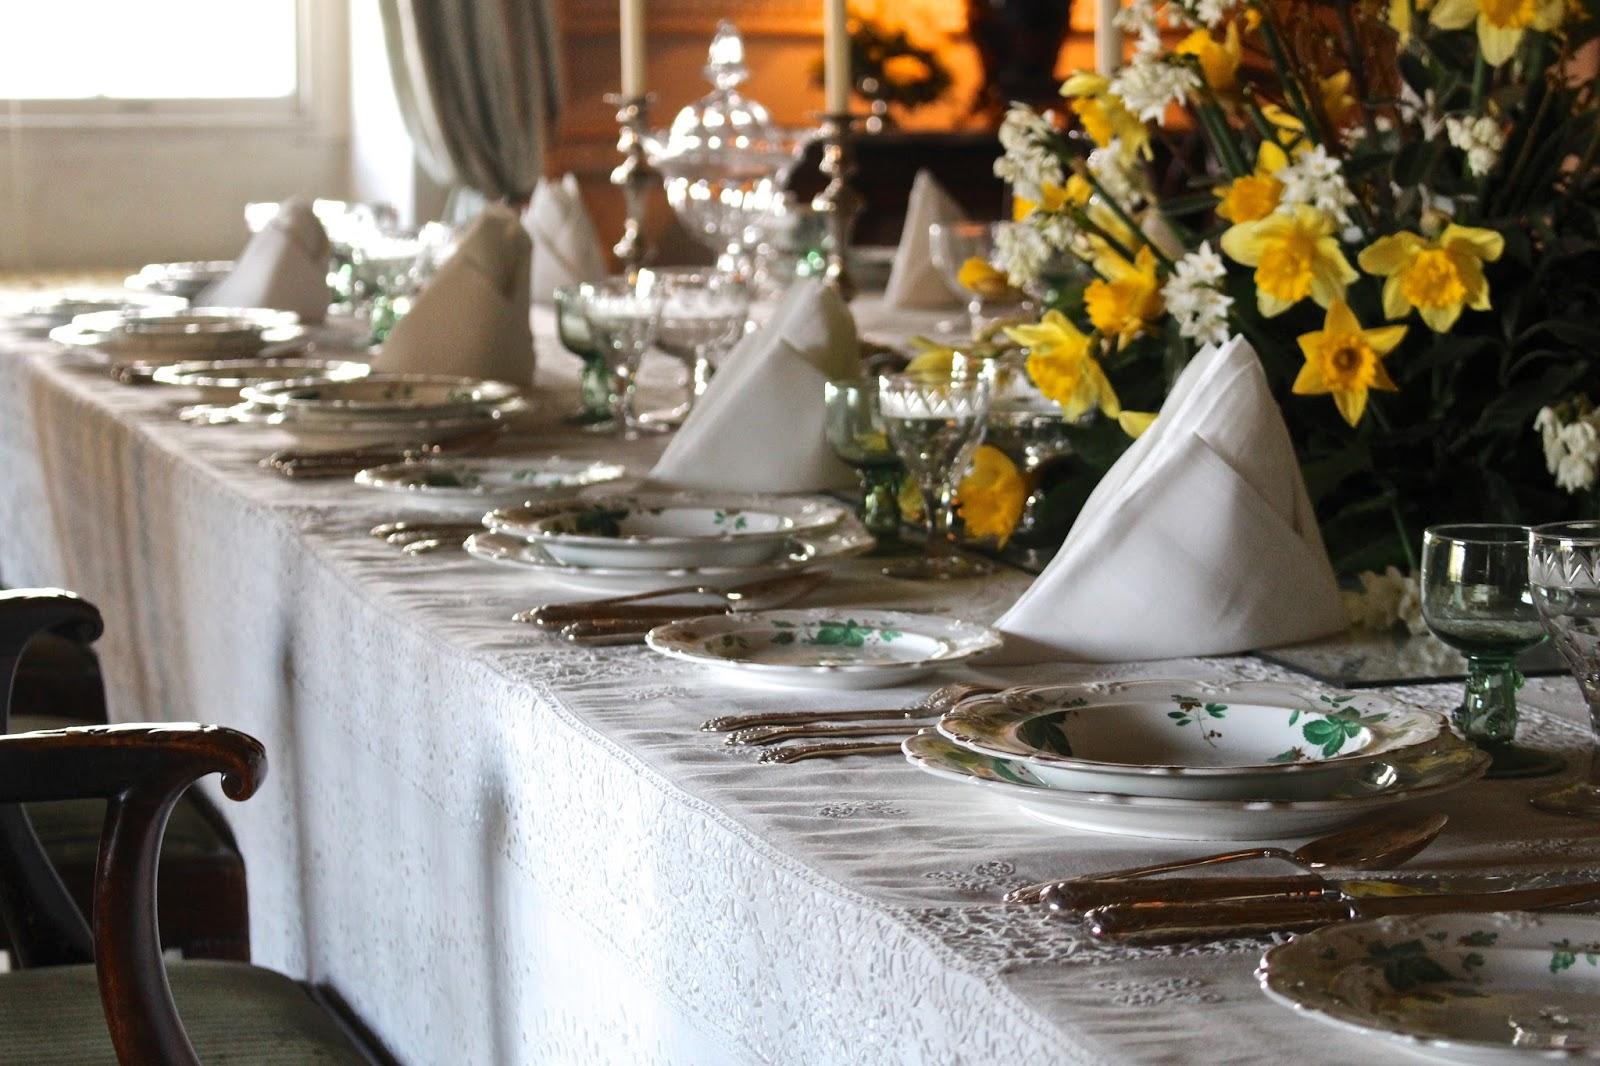 basildon park dining room